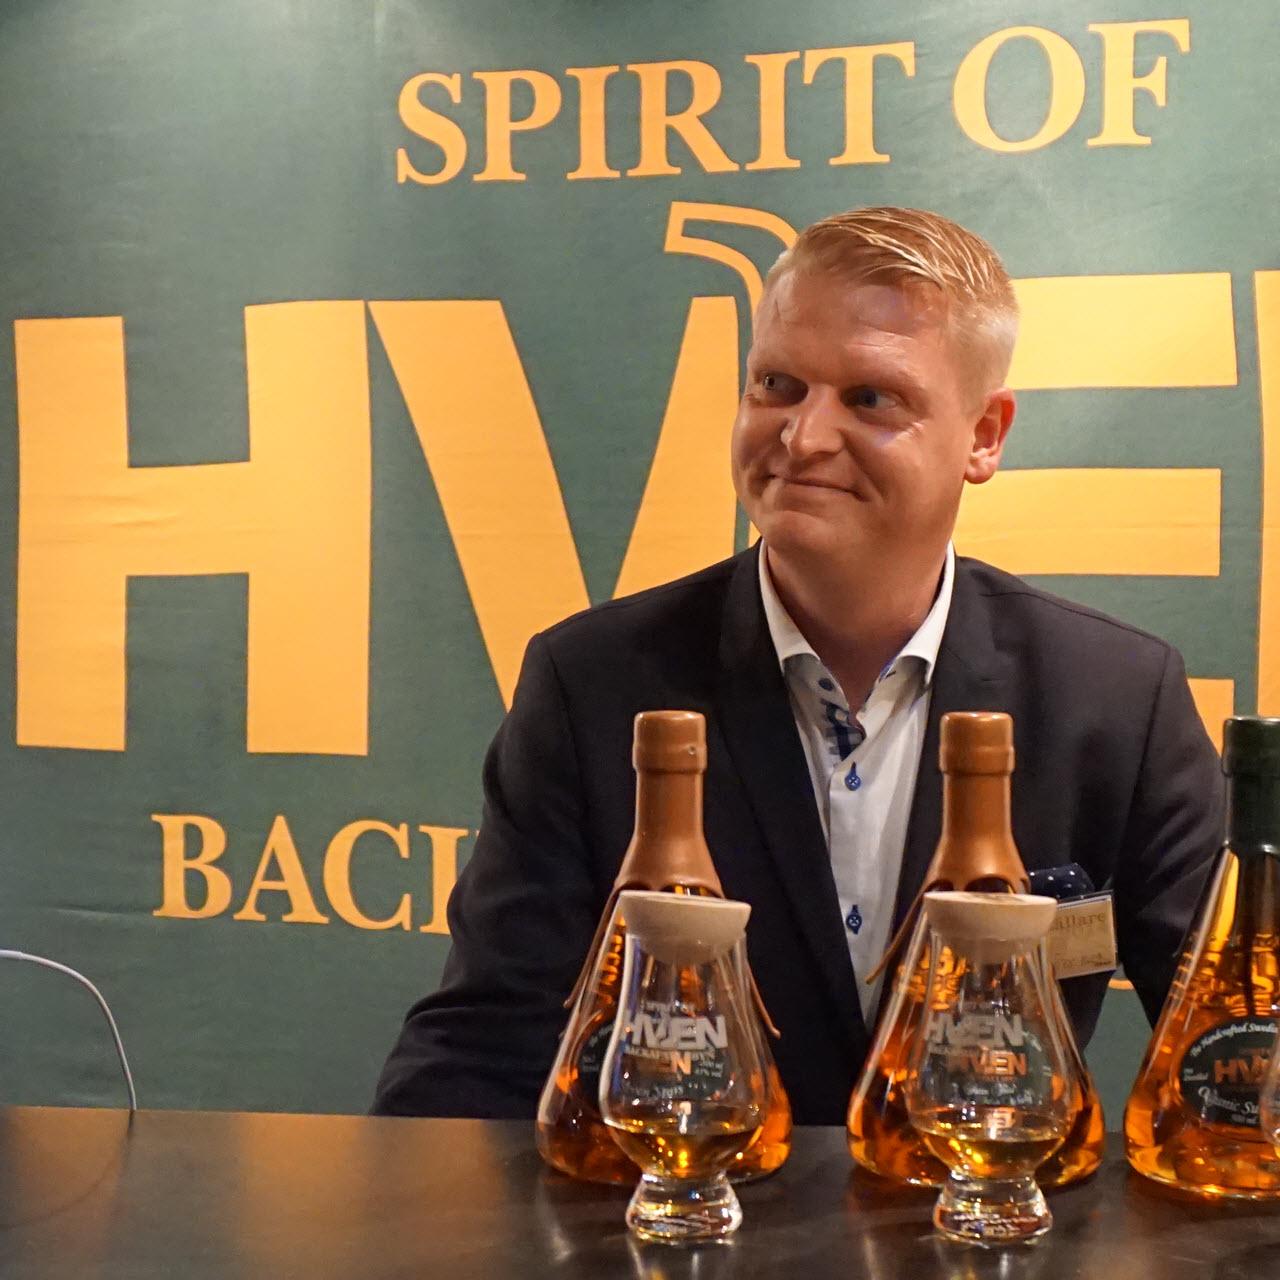 Stockholm Beer and Whisky Festival - Spirit of Hven